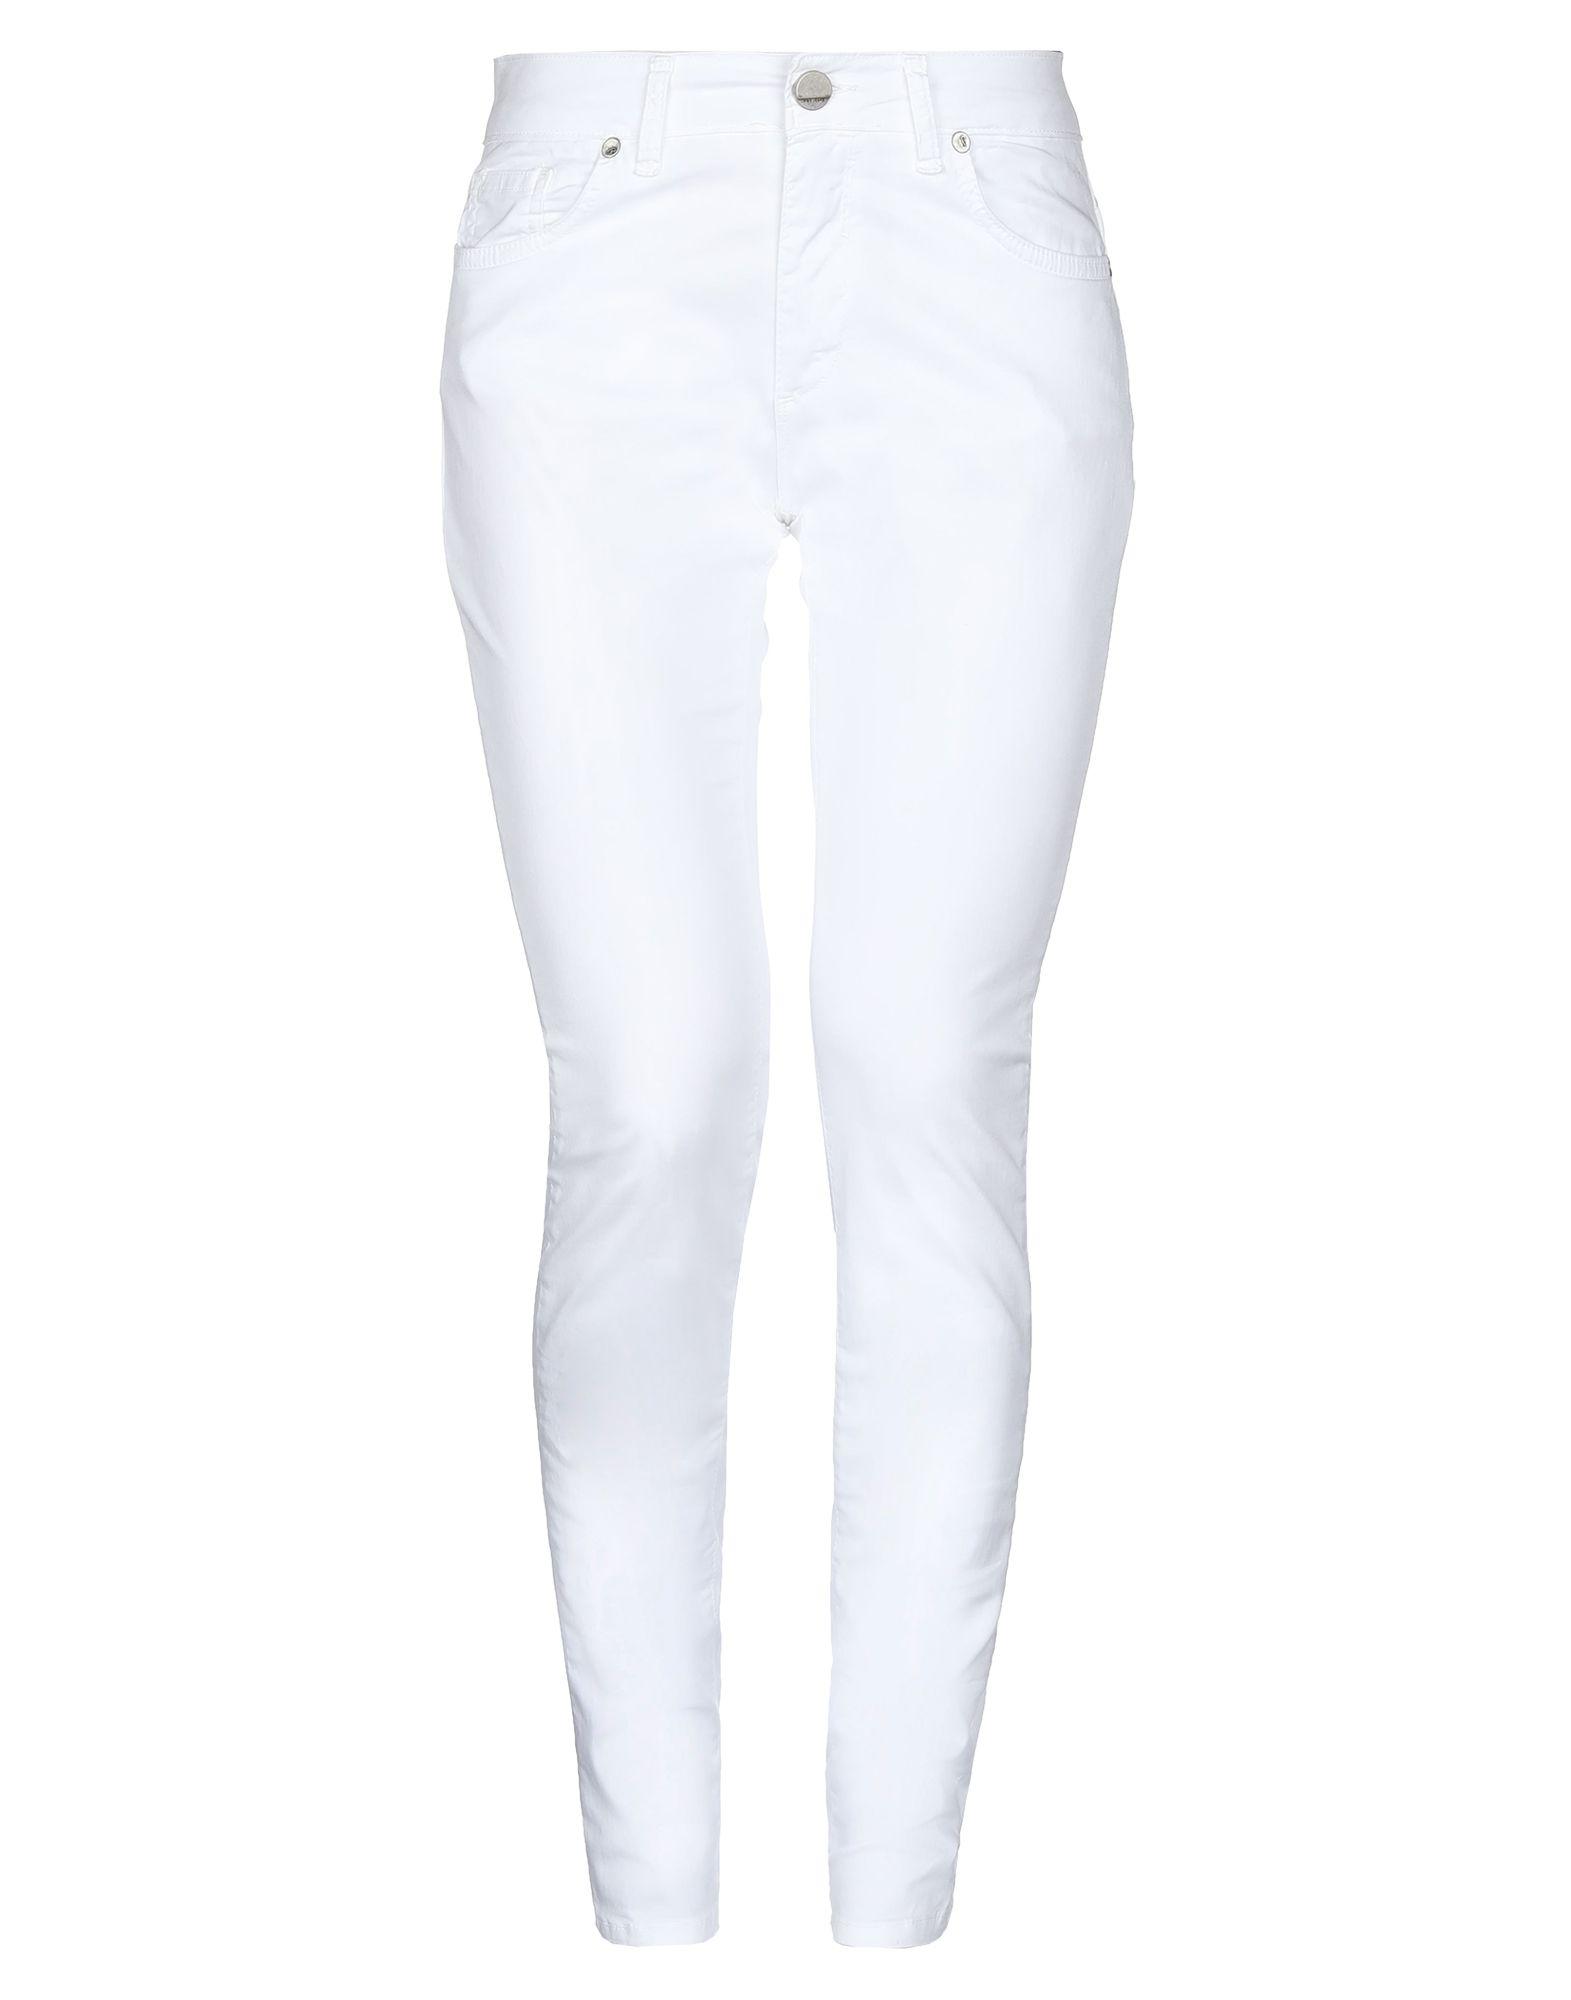 SANDRO FERRONE Повседневные брюки sandro ferrone повседневные брюки